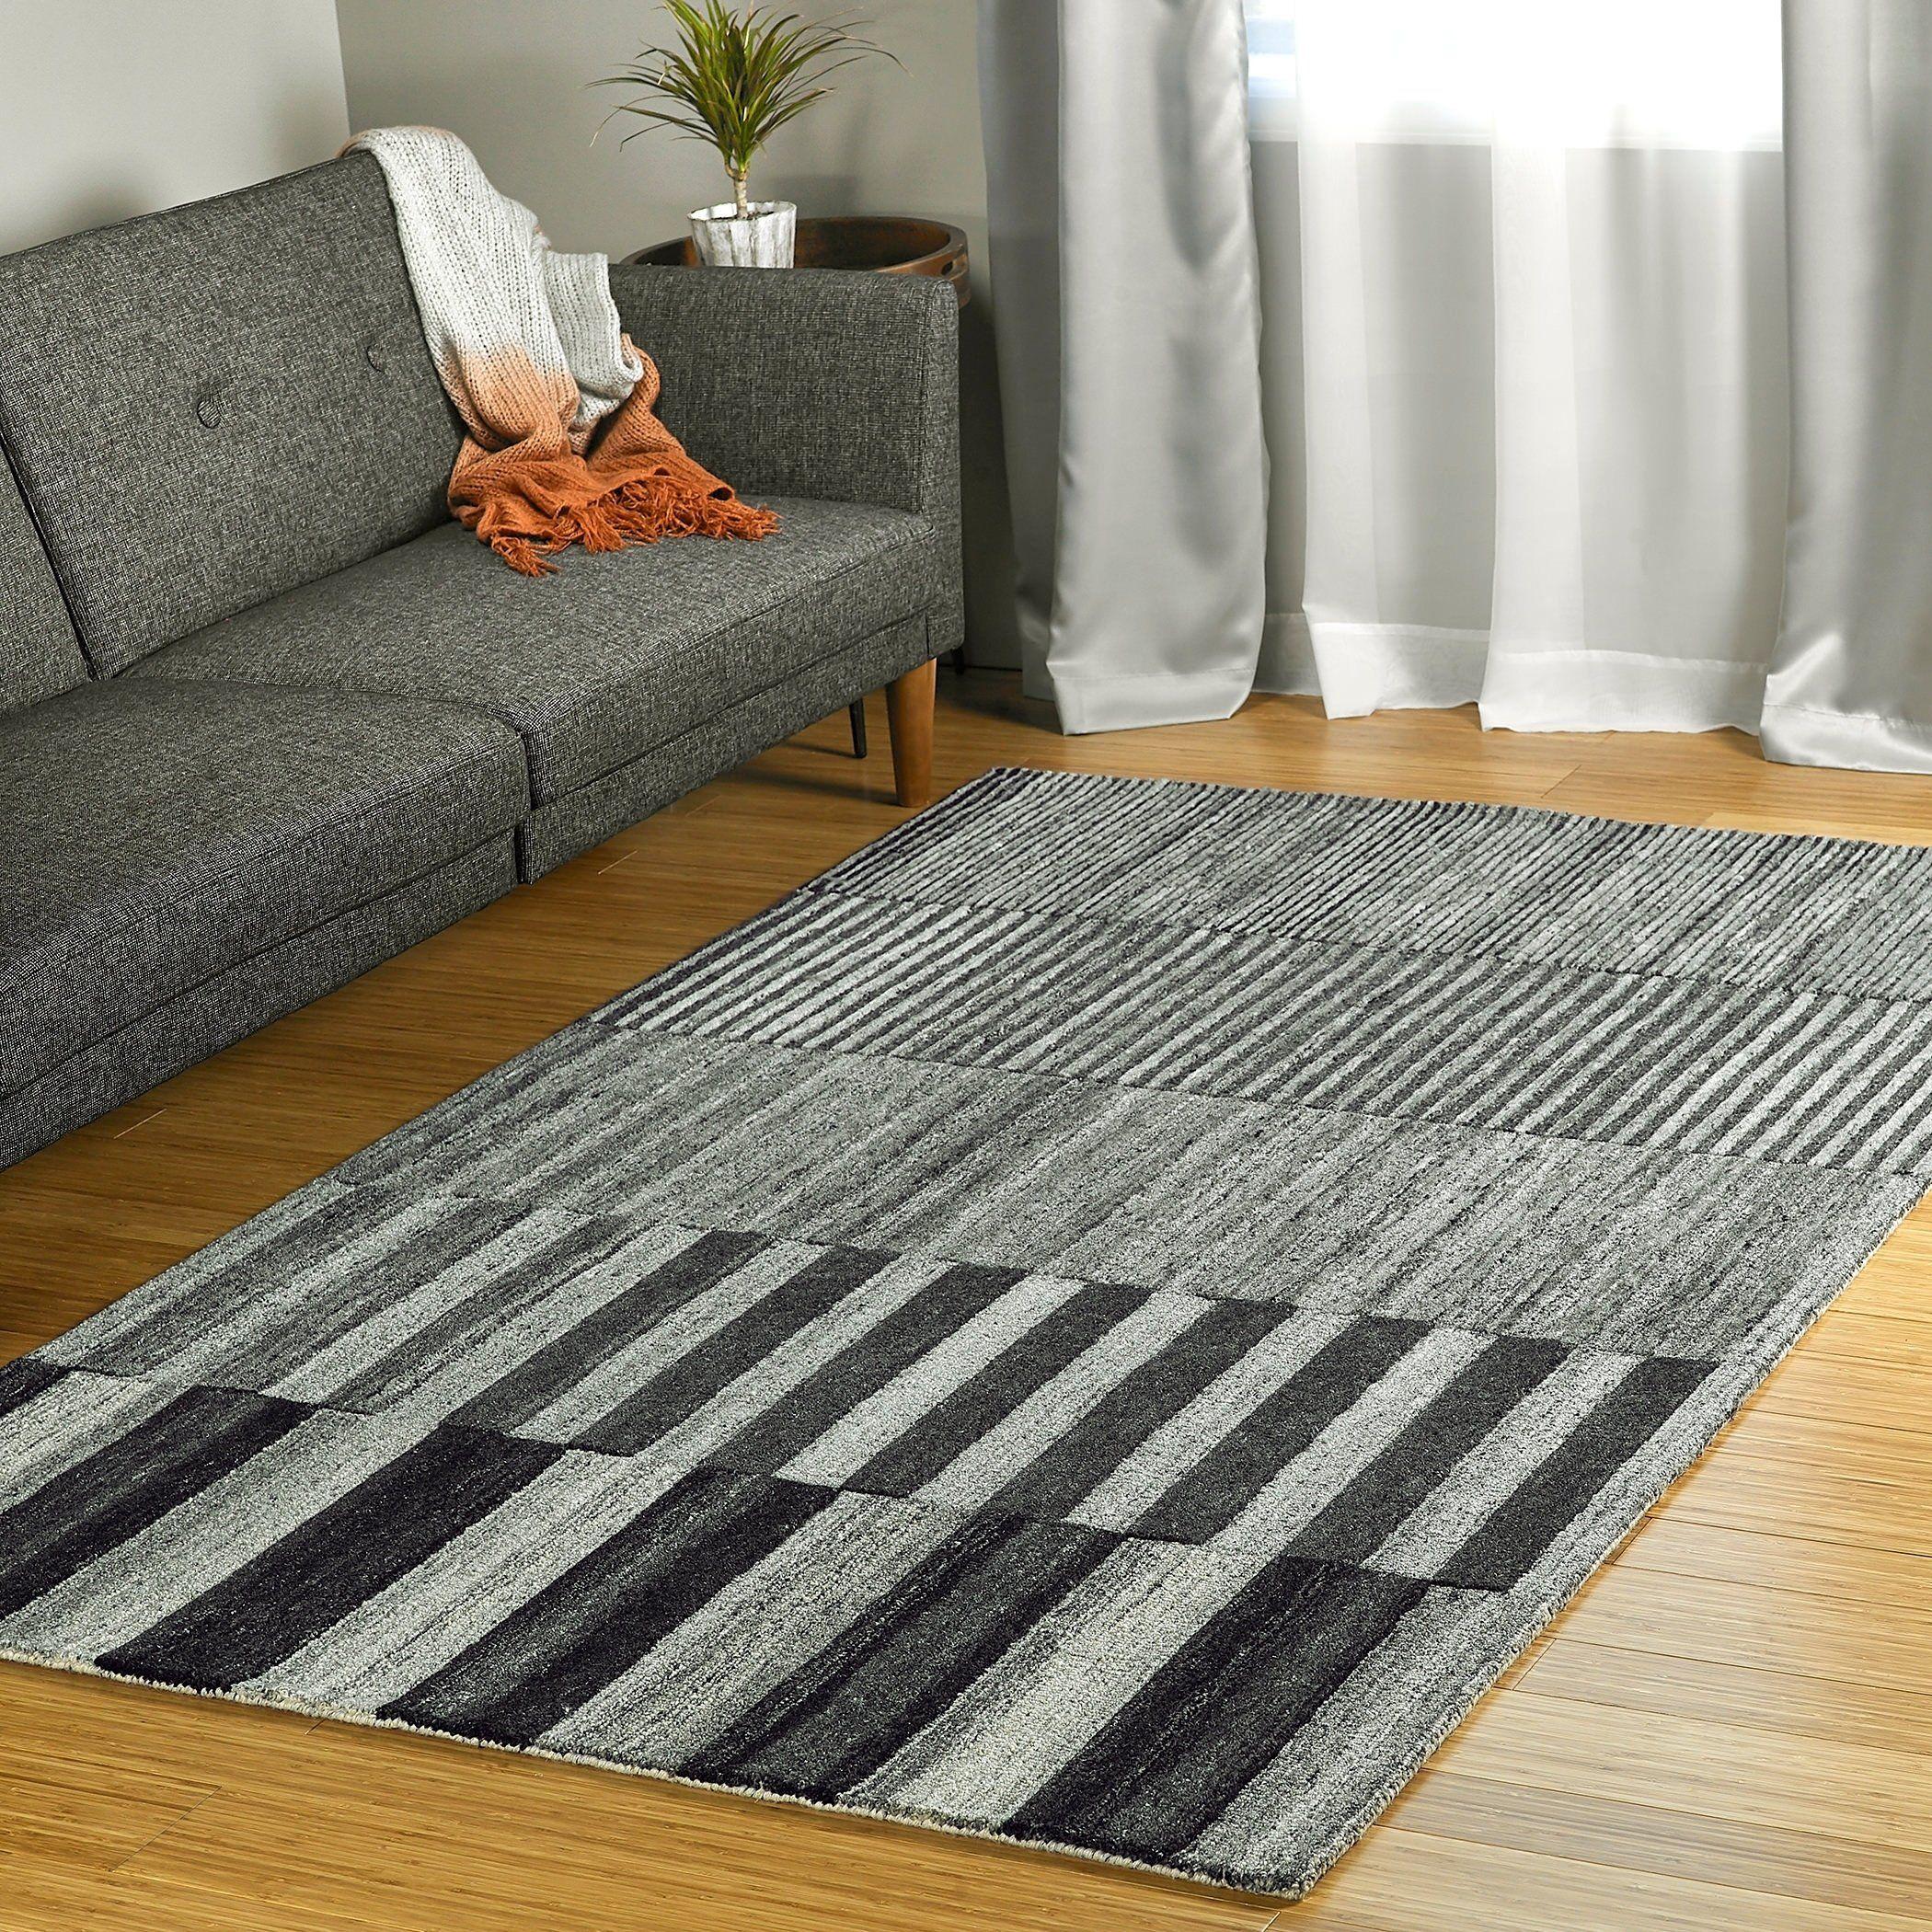 Colab Handmade Wool Area Rug Charcoal 5 X 7 9 Grey Bombay